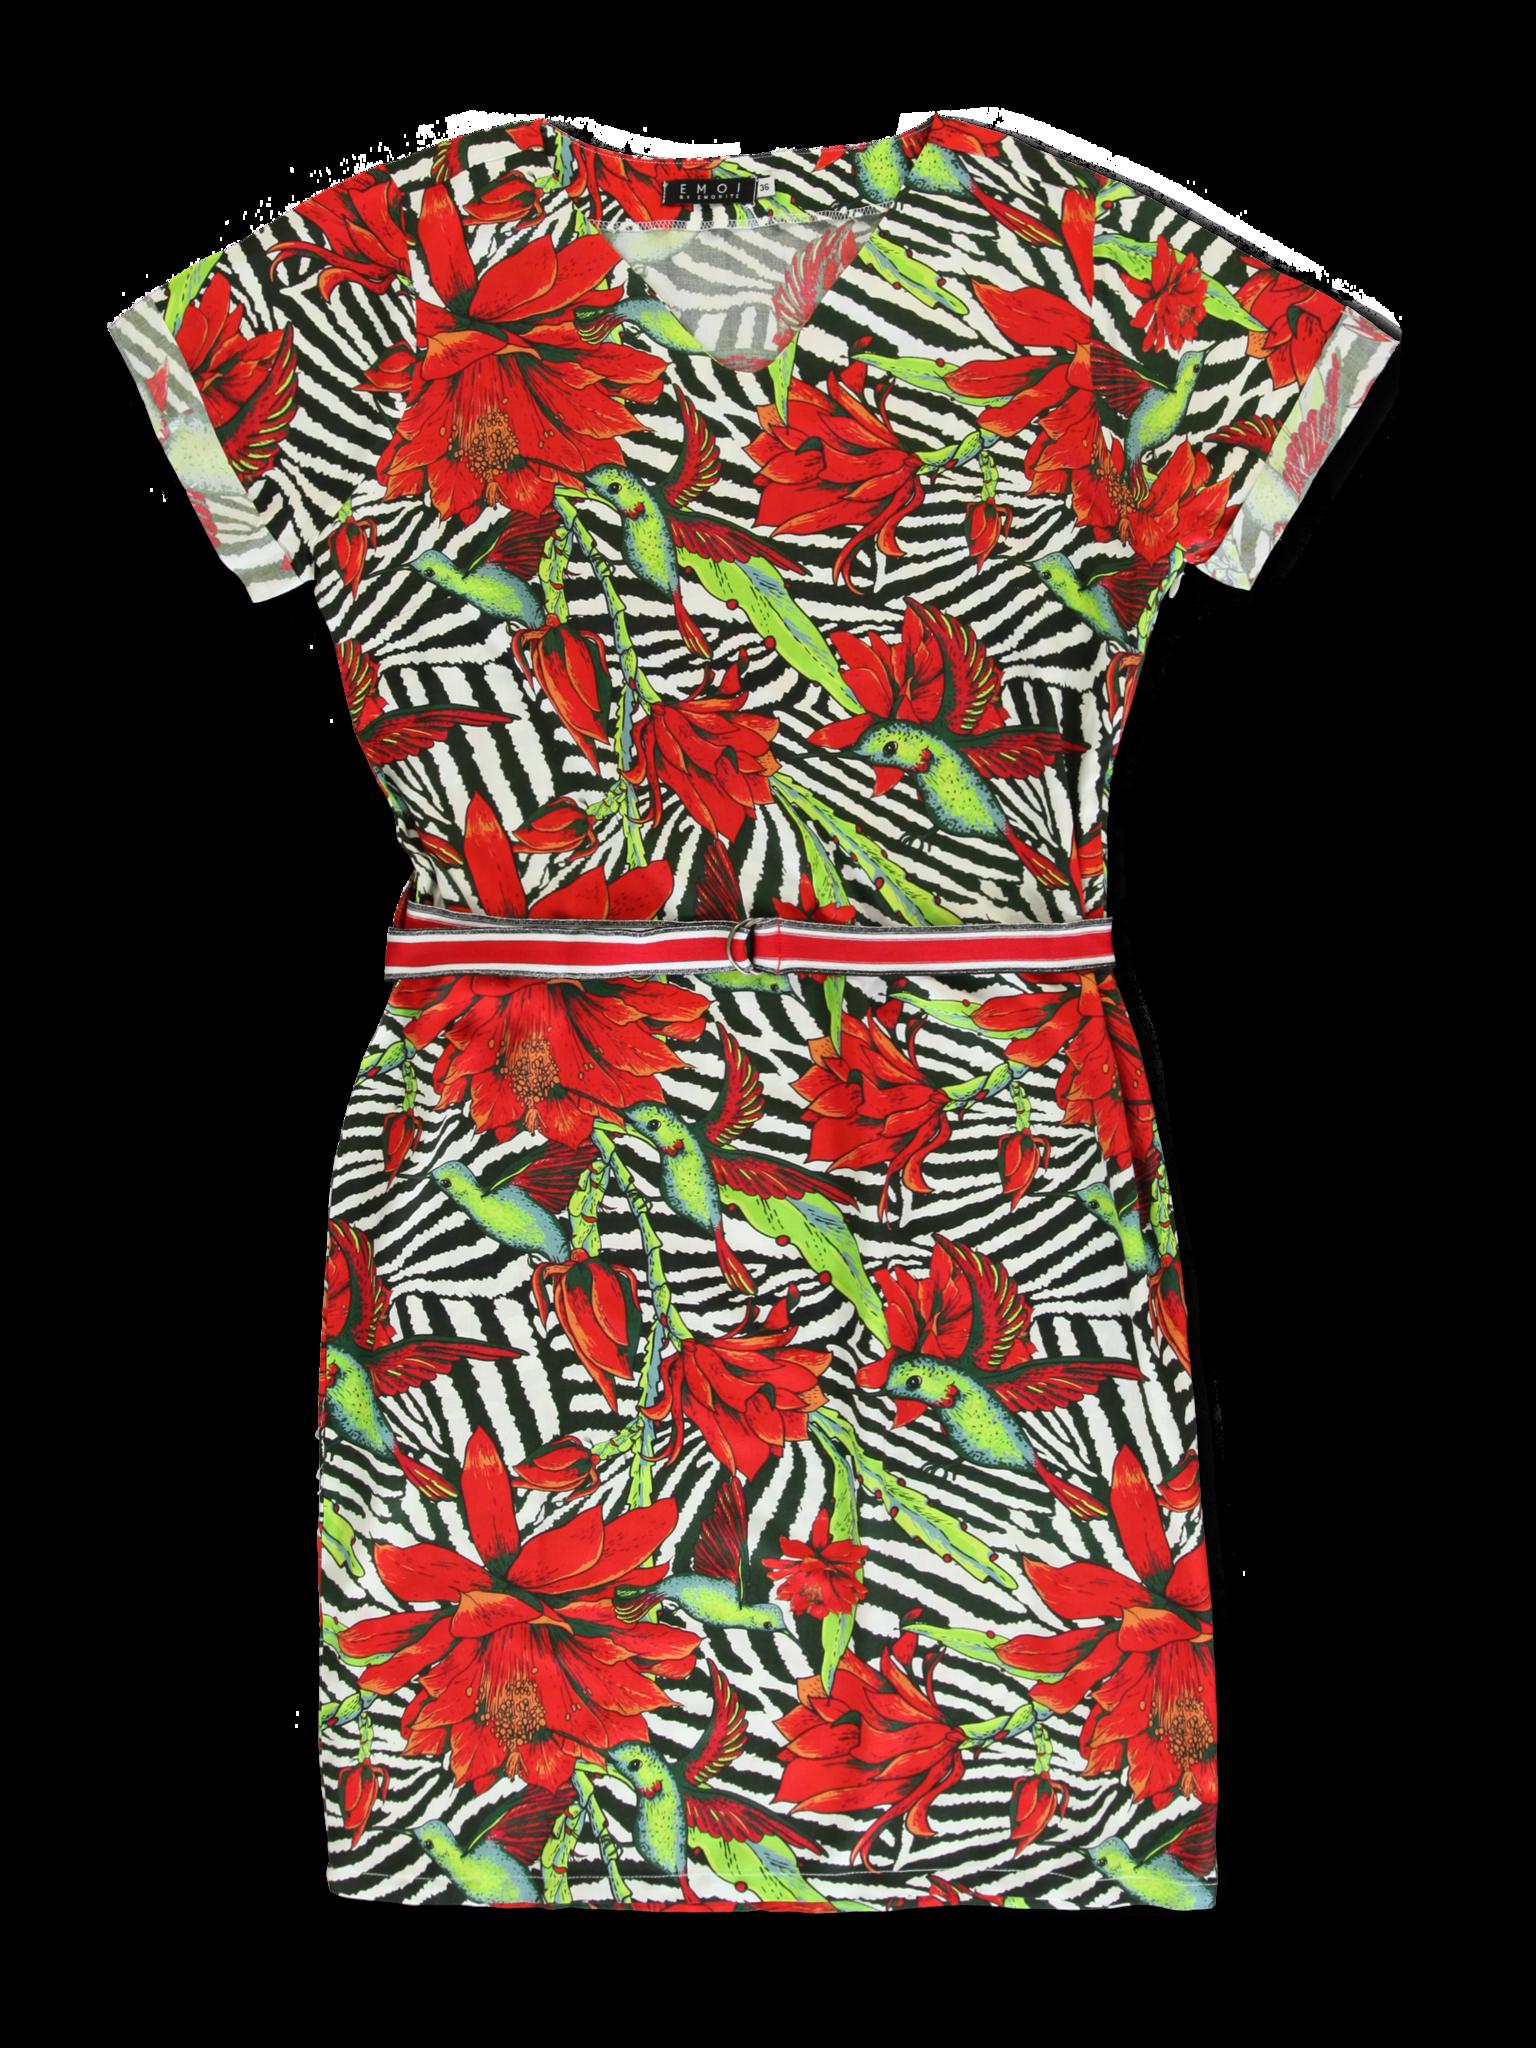 All Brands | Summerproducts Ladies | Dress | 10 pcs/box